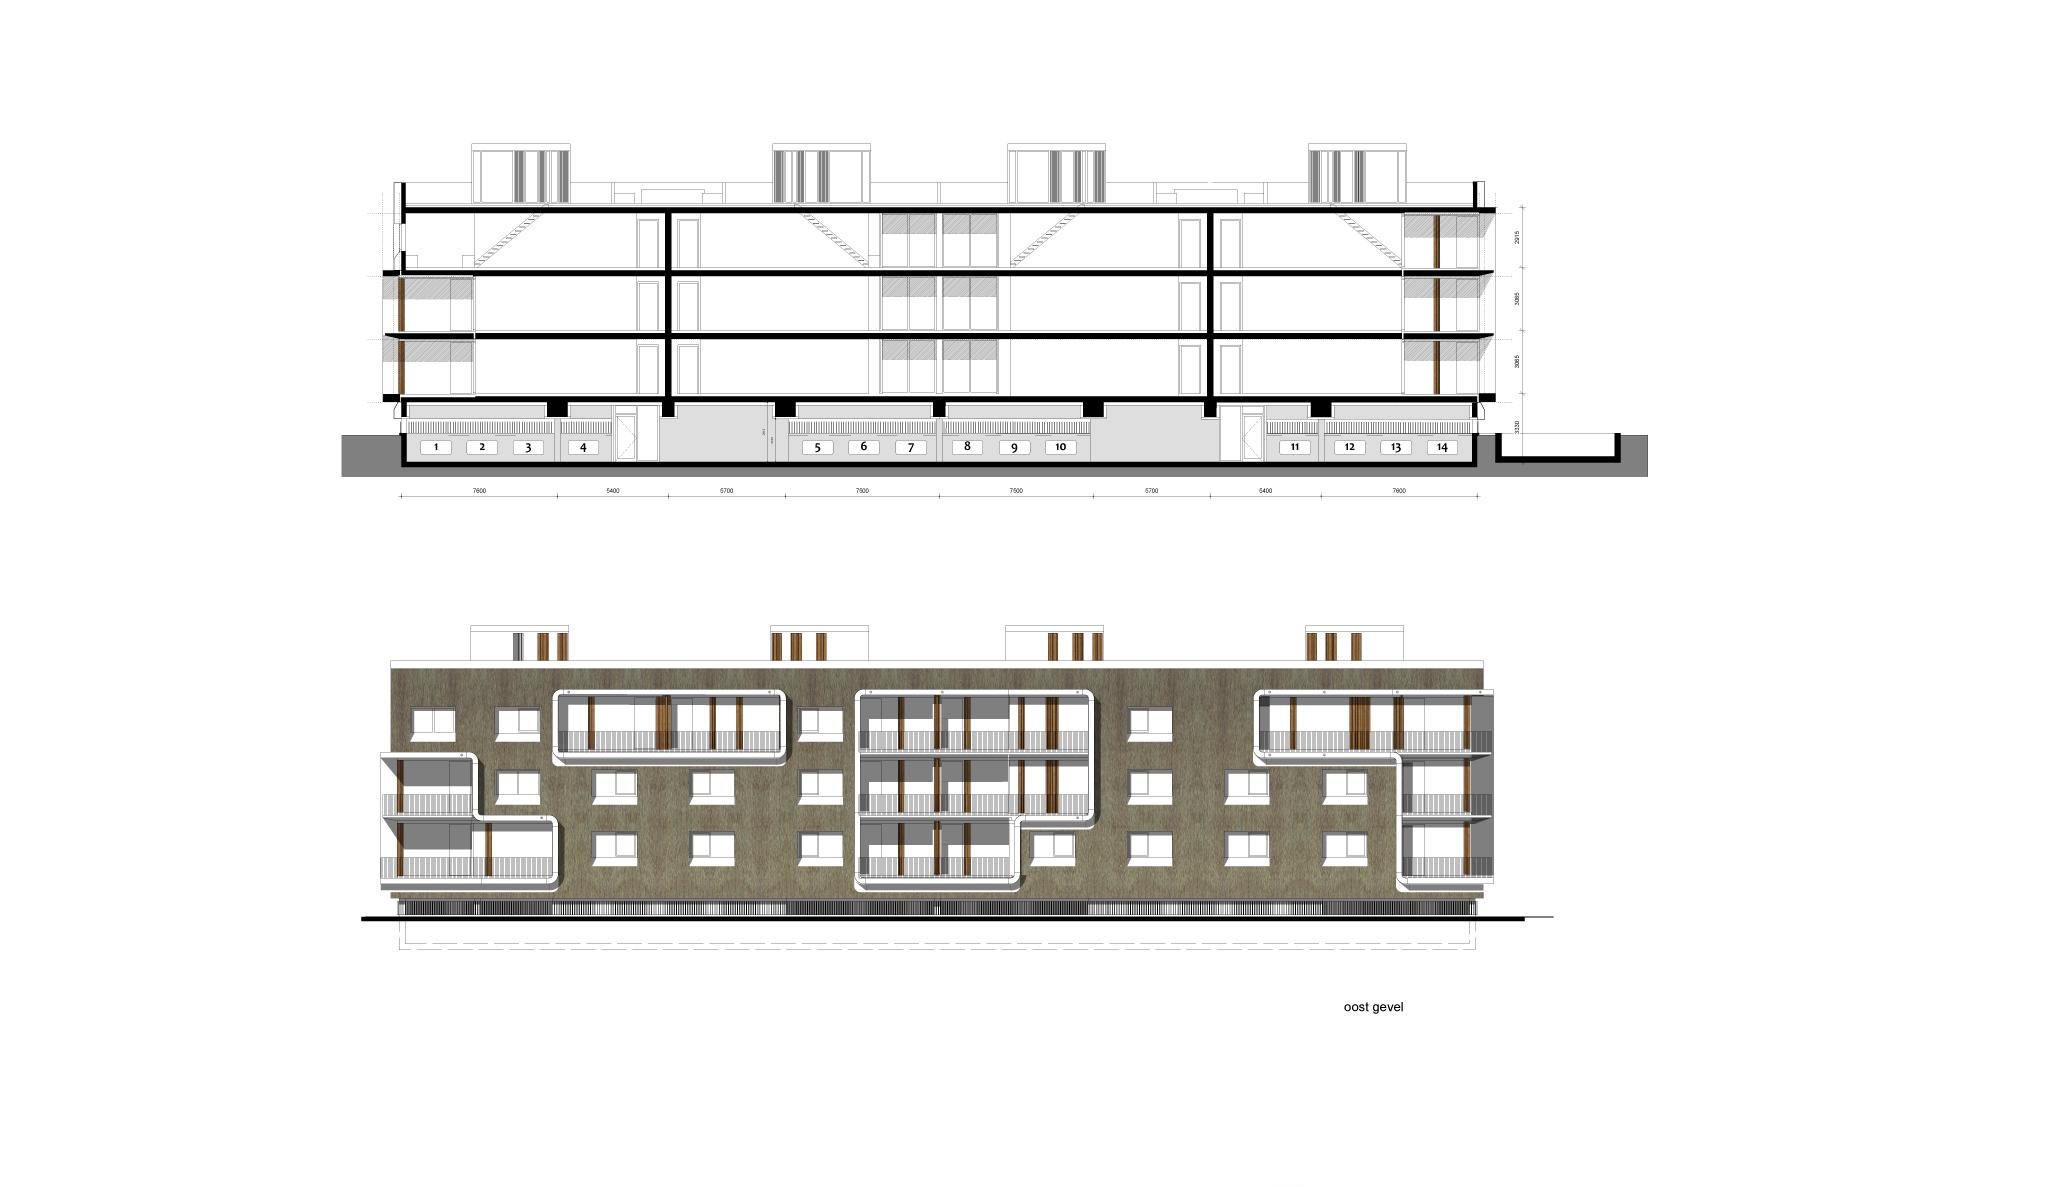 Simone Drost Architecture Planet Pab Architecture Appartementen Stadhouderspark Vught geveltekening en doorsnede